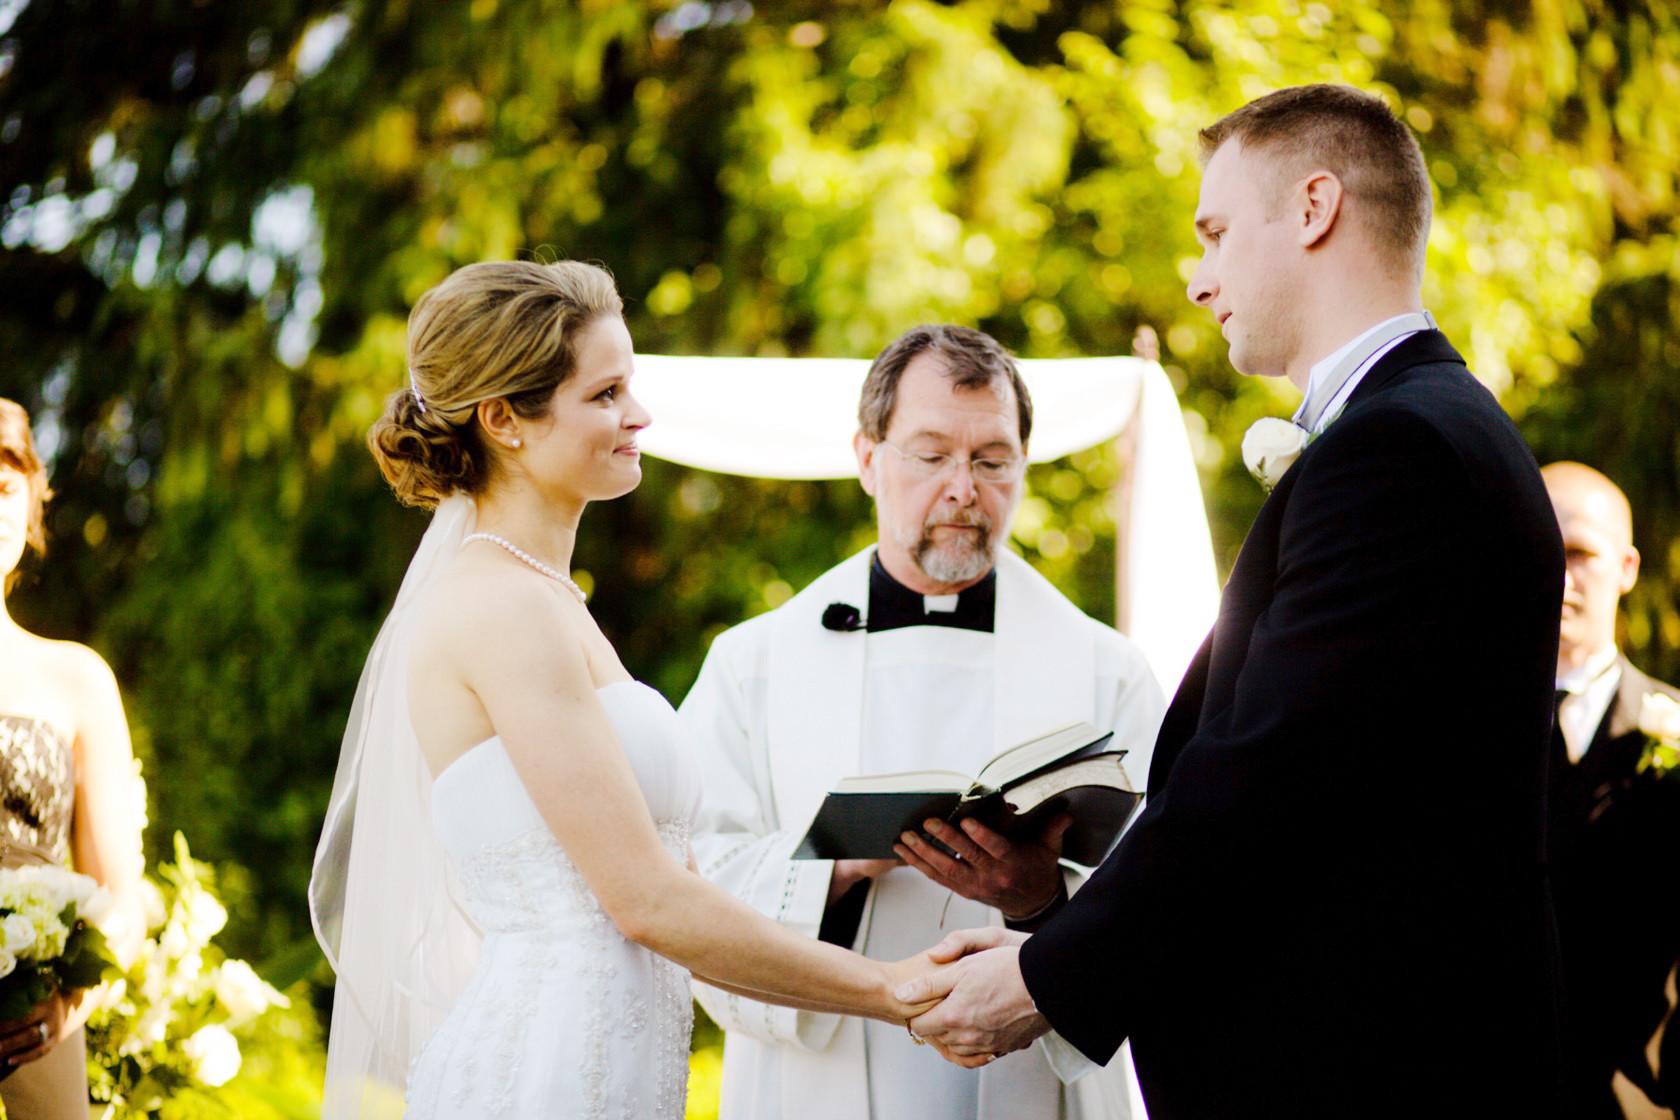 stephen sager photography 0101 fine art wedding photography